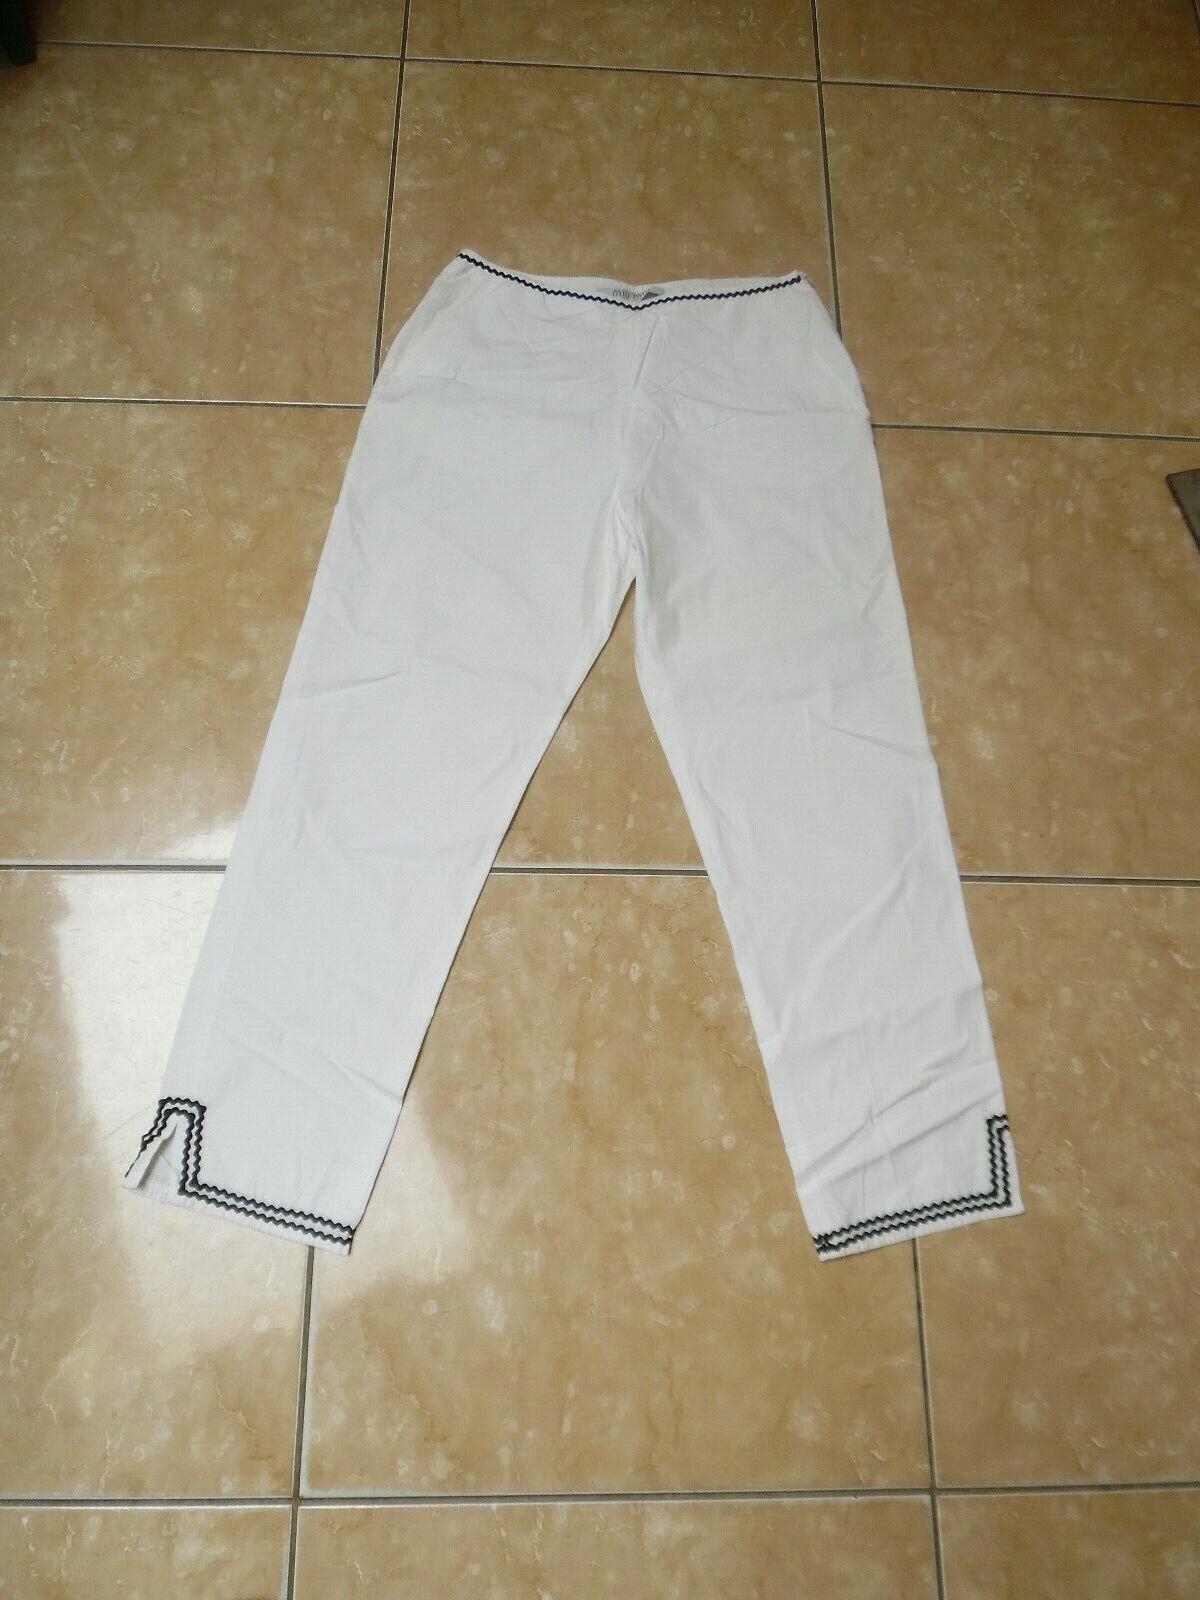 MIU MIU joli pantalon taille 36